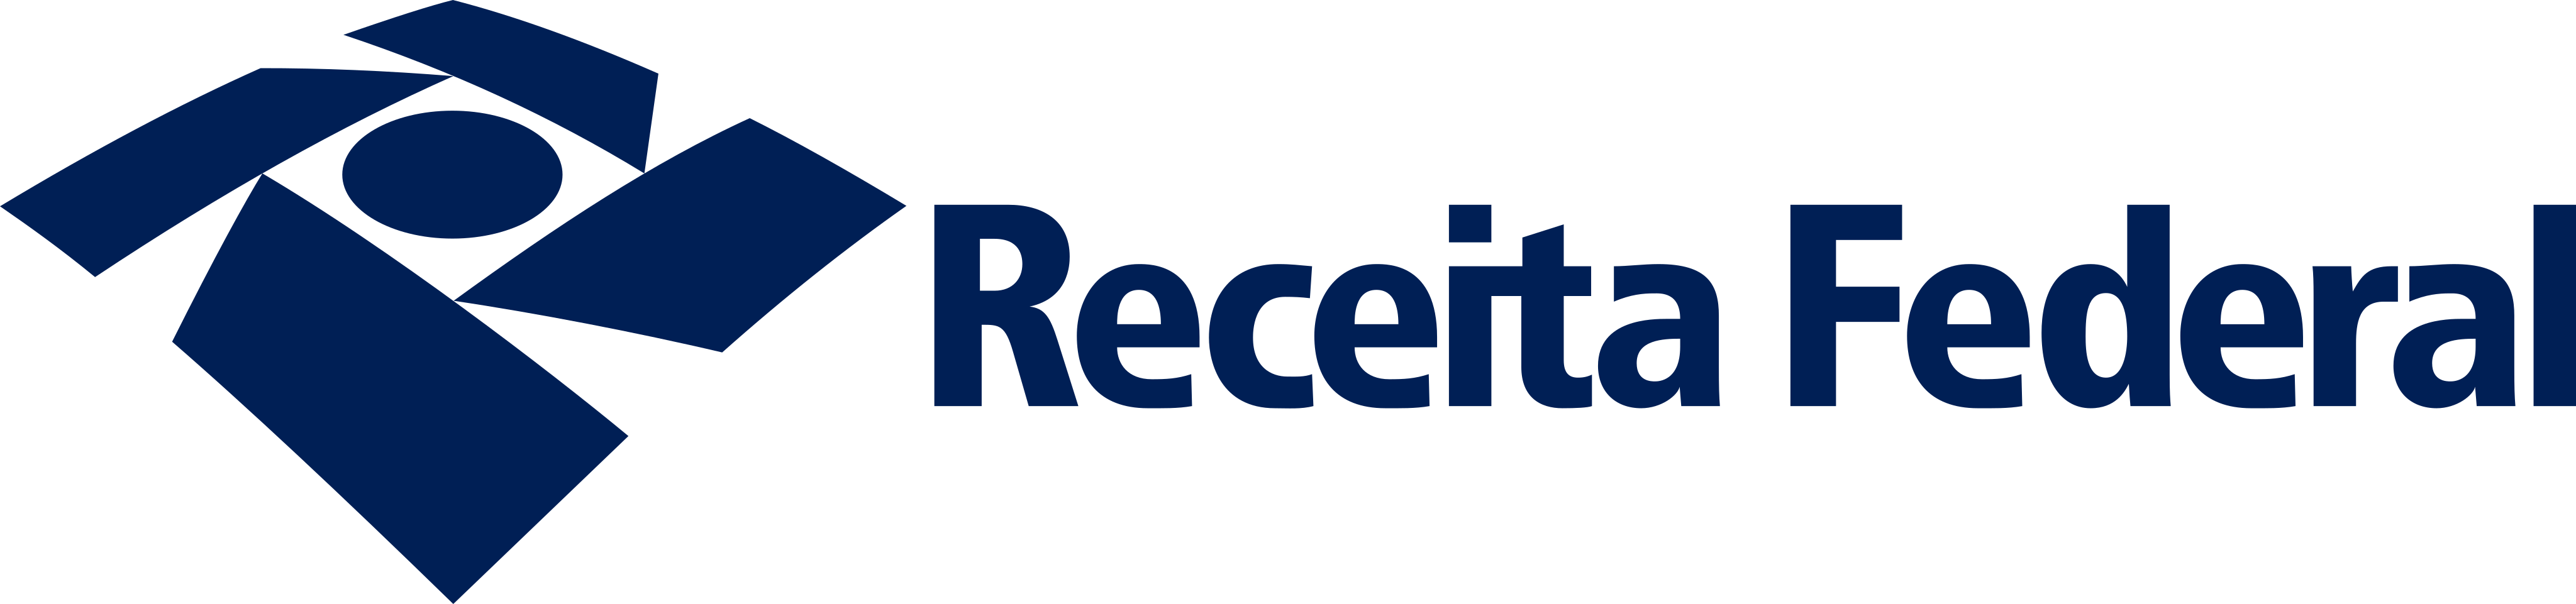 receita federal logo 1 - Receita Federal Logo